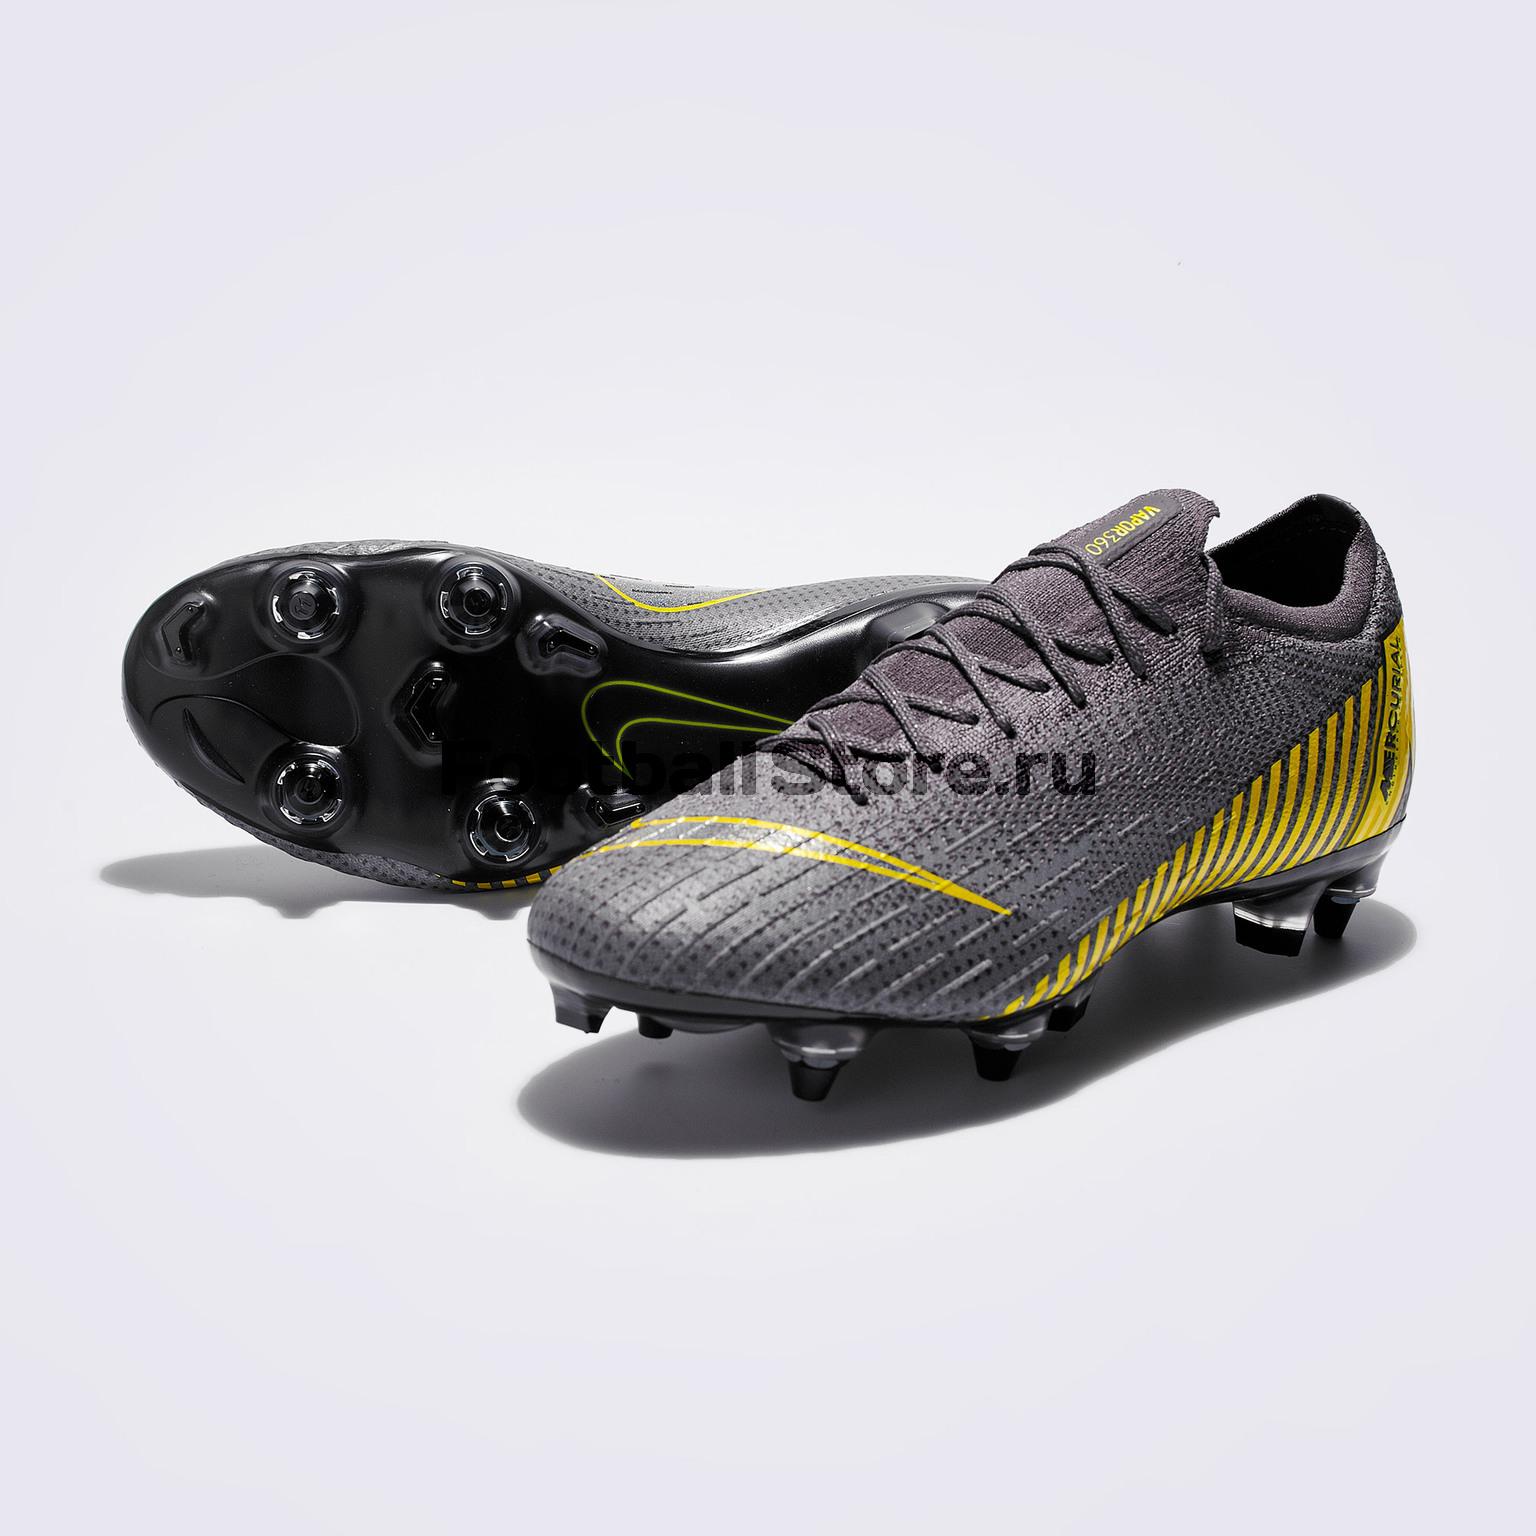 Бутсы Nike Vapor 12 Elite SG-Pro AC AH7381-070 бутсы детские nike phantom vision academy df sg aq9298 400